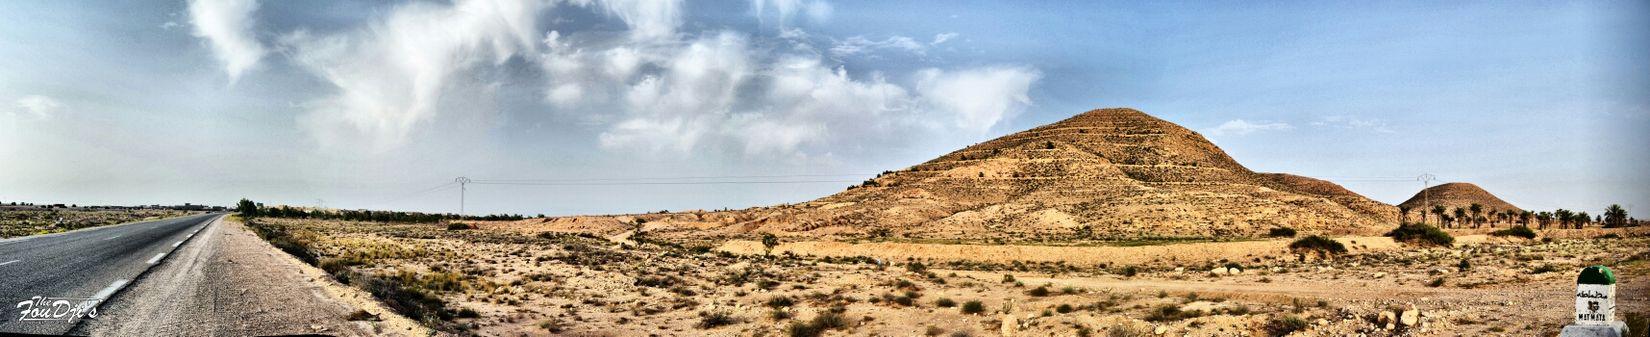 Matmata Tunisia Gabes FouDji's